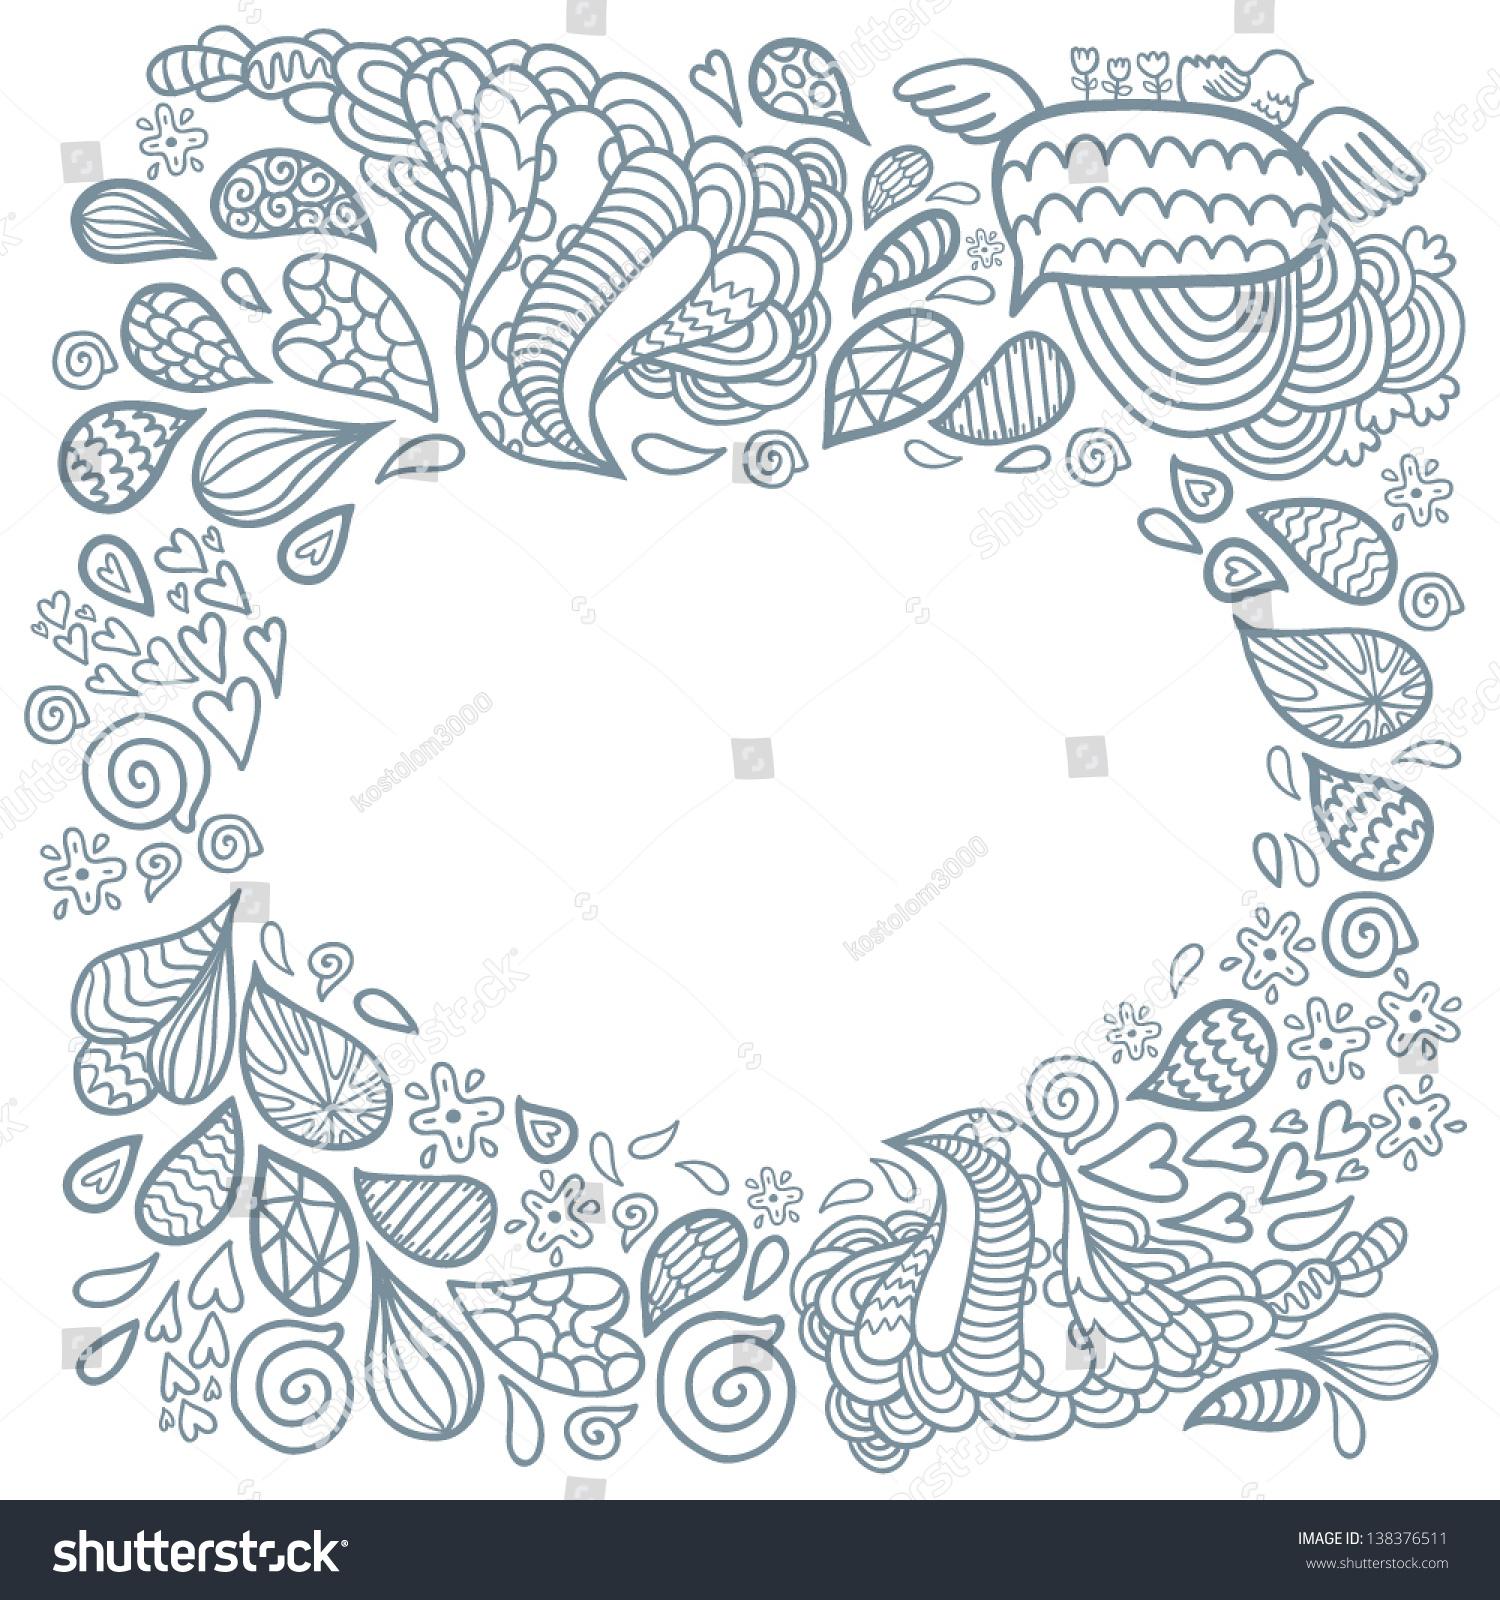 Cute Cartoon Doodle Frame Doodle Background Stock Vector (Royalty ...